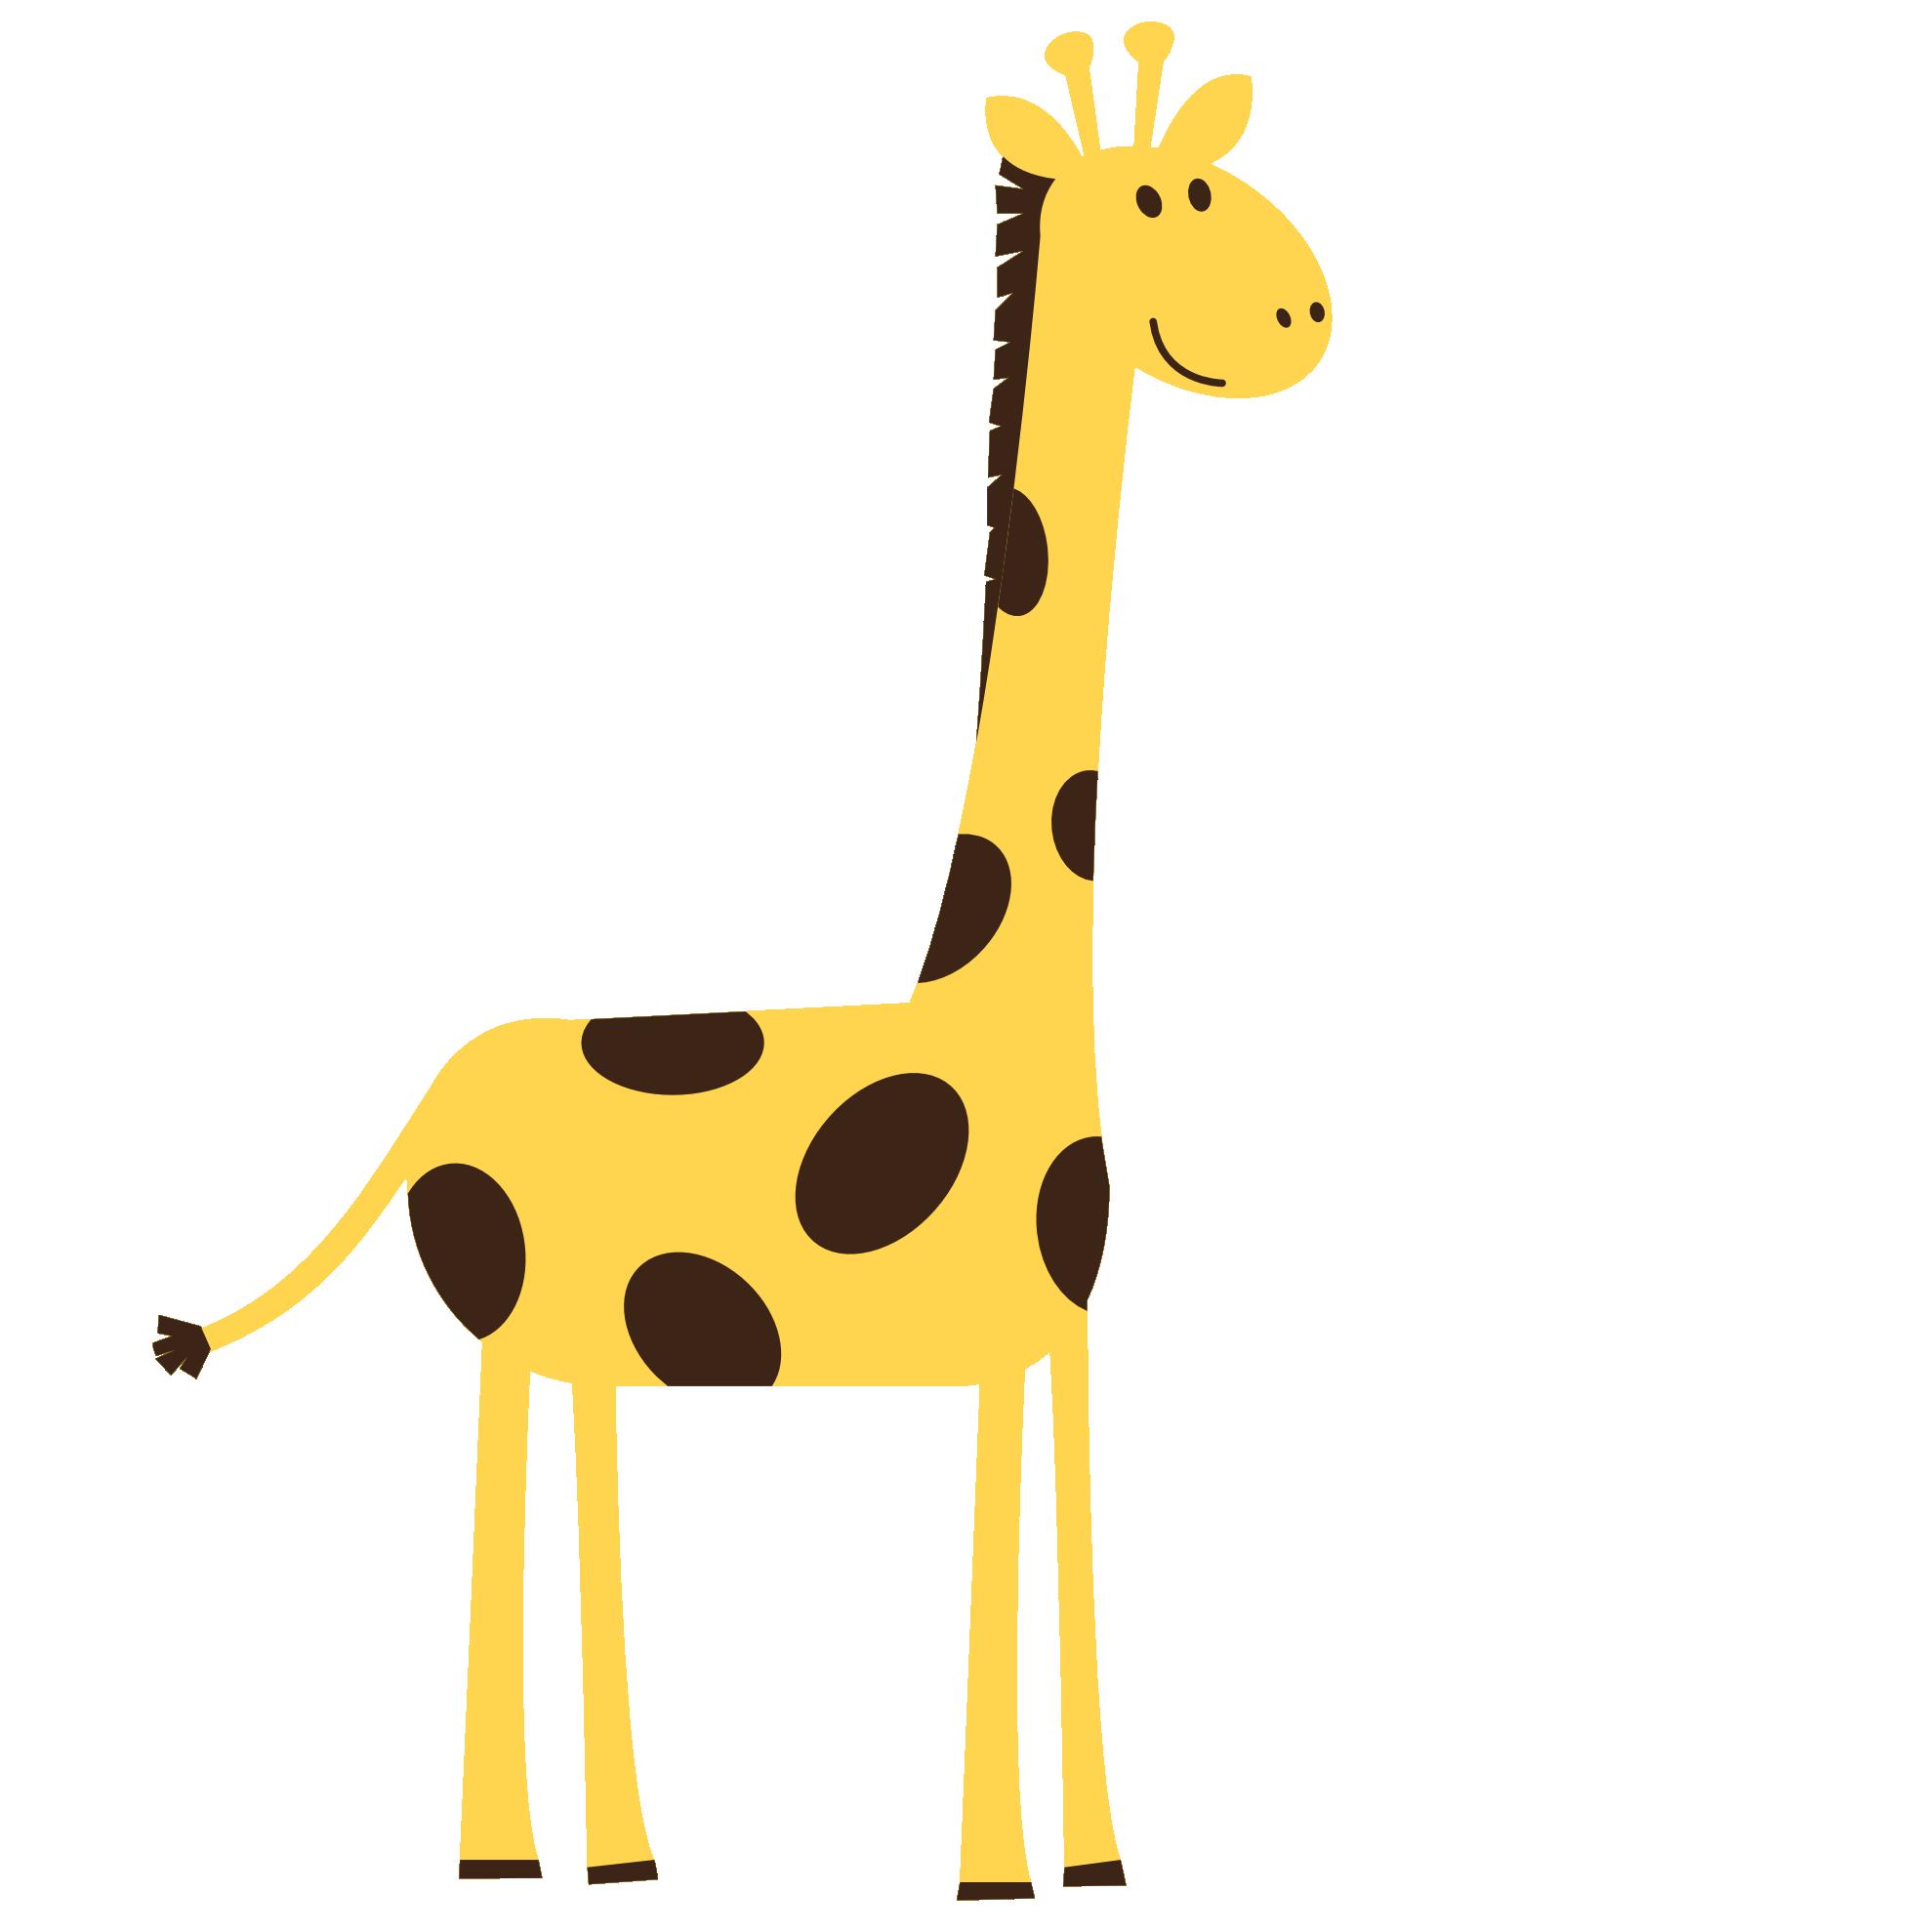 Baby Shower Giraffe Clip Art Baby Giraffe Clipart Black And